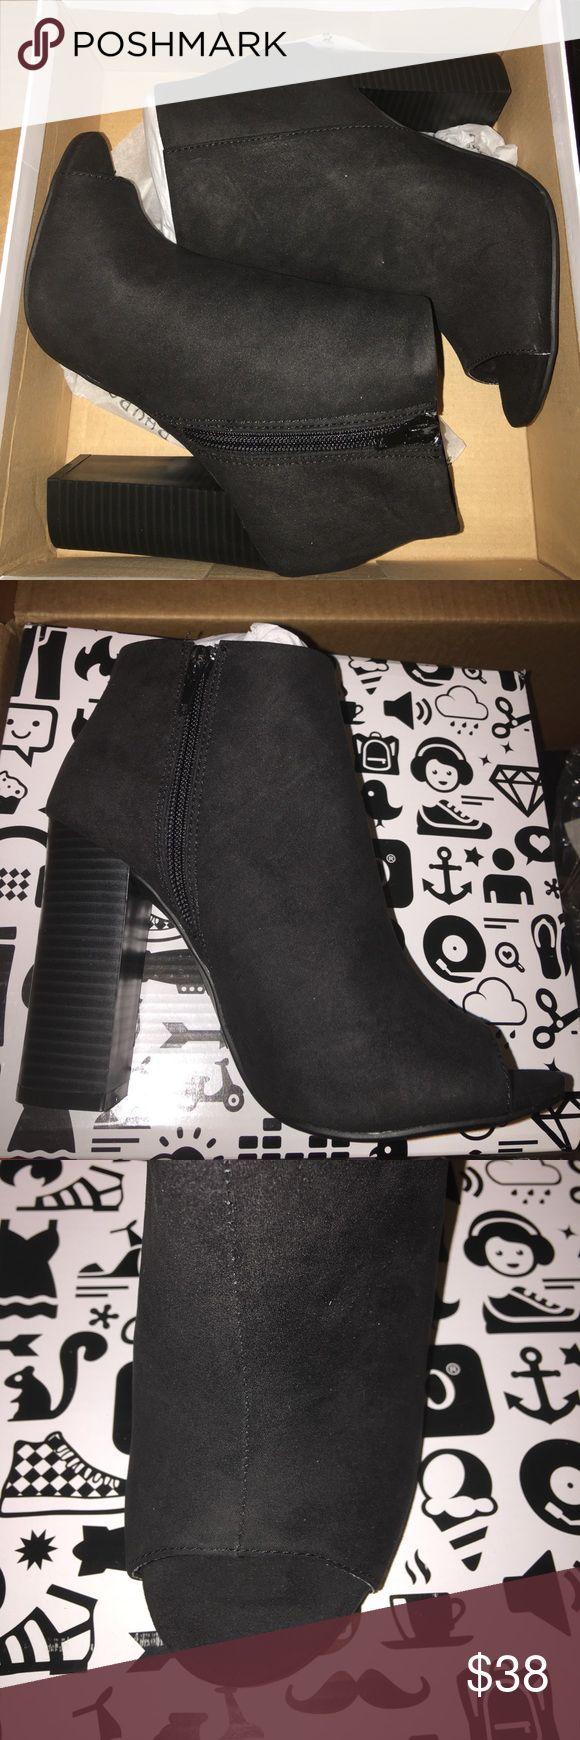 New peep toe black zip heel boots size 7 Beautiful black peep toe heel bootie, zip up sides, high heel, size 7 bamboo charlotte russe Shoes Heels